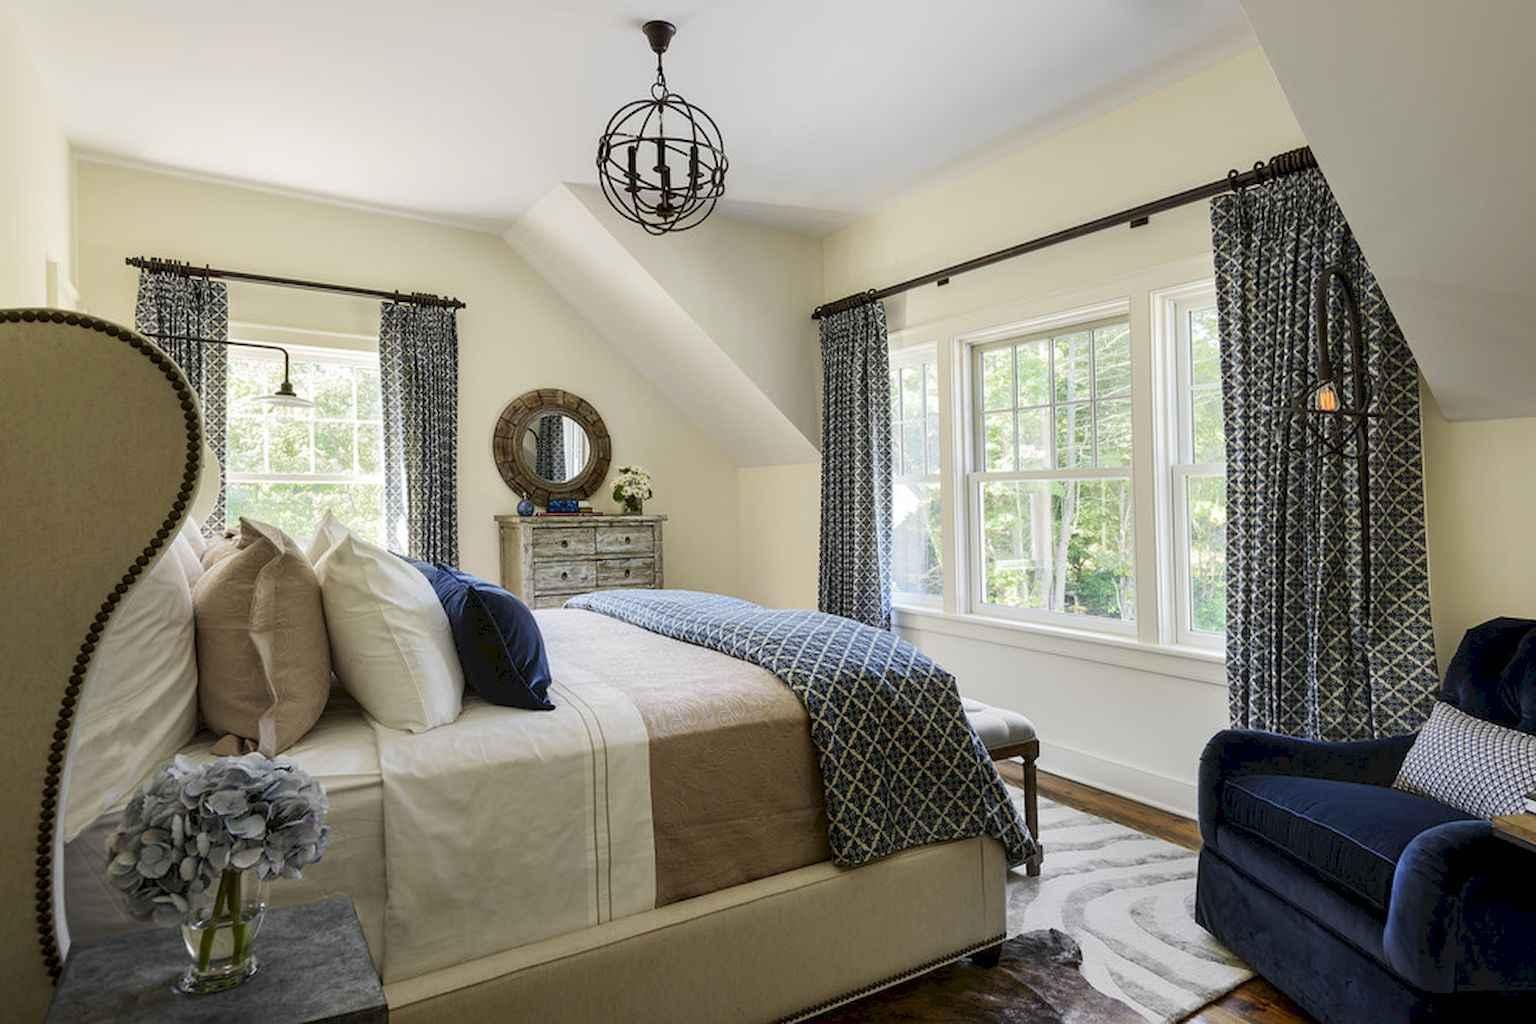 100 Stunning Farmhouse Master Bedroom Decor Ideas (73)